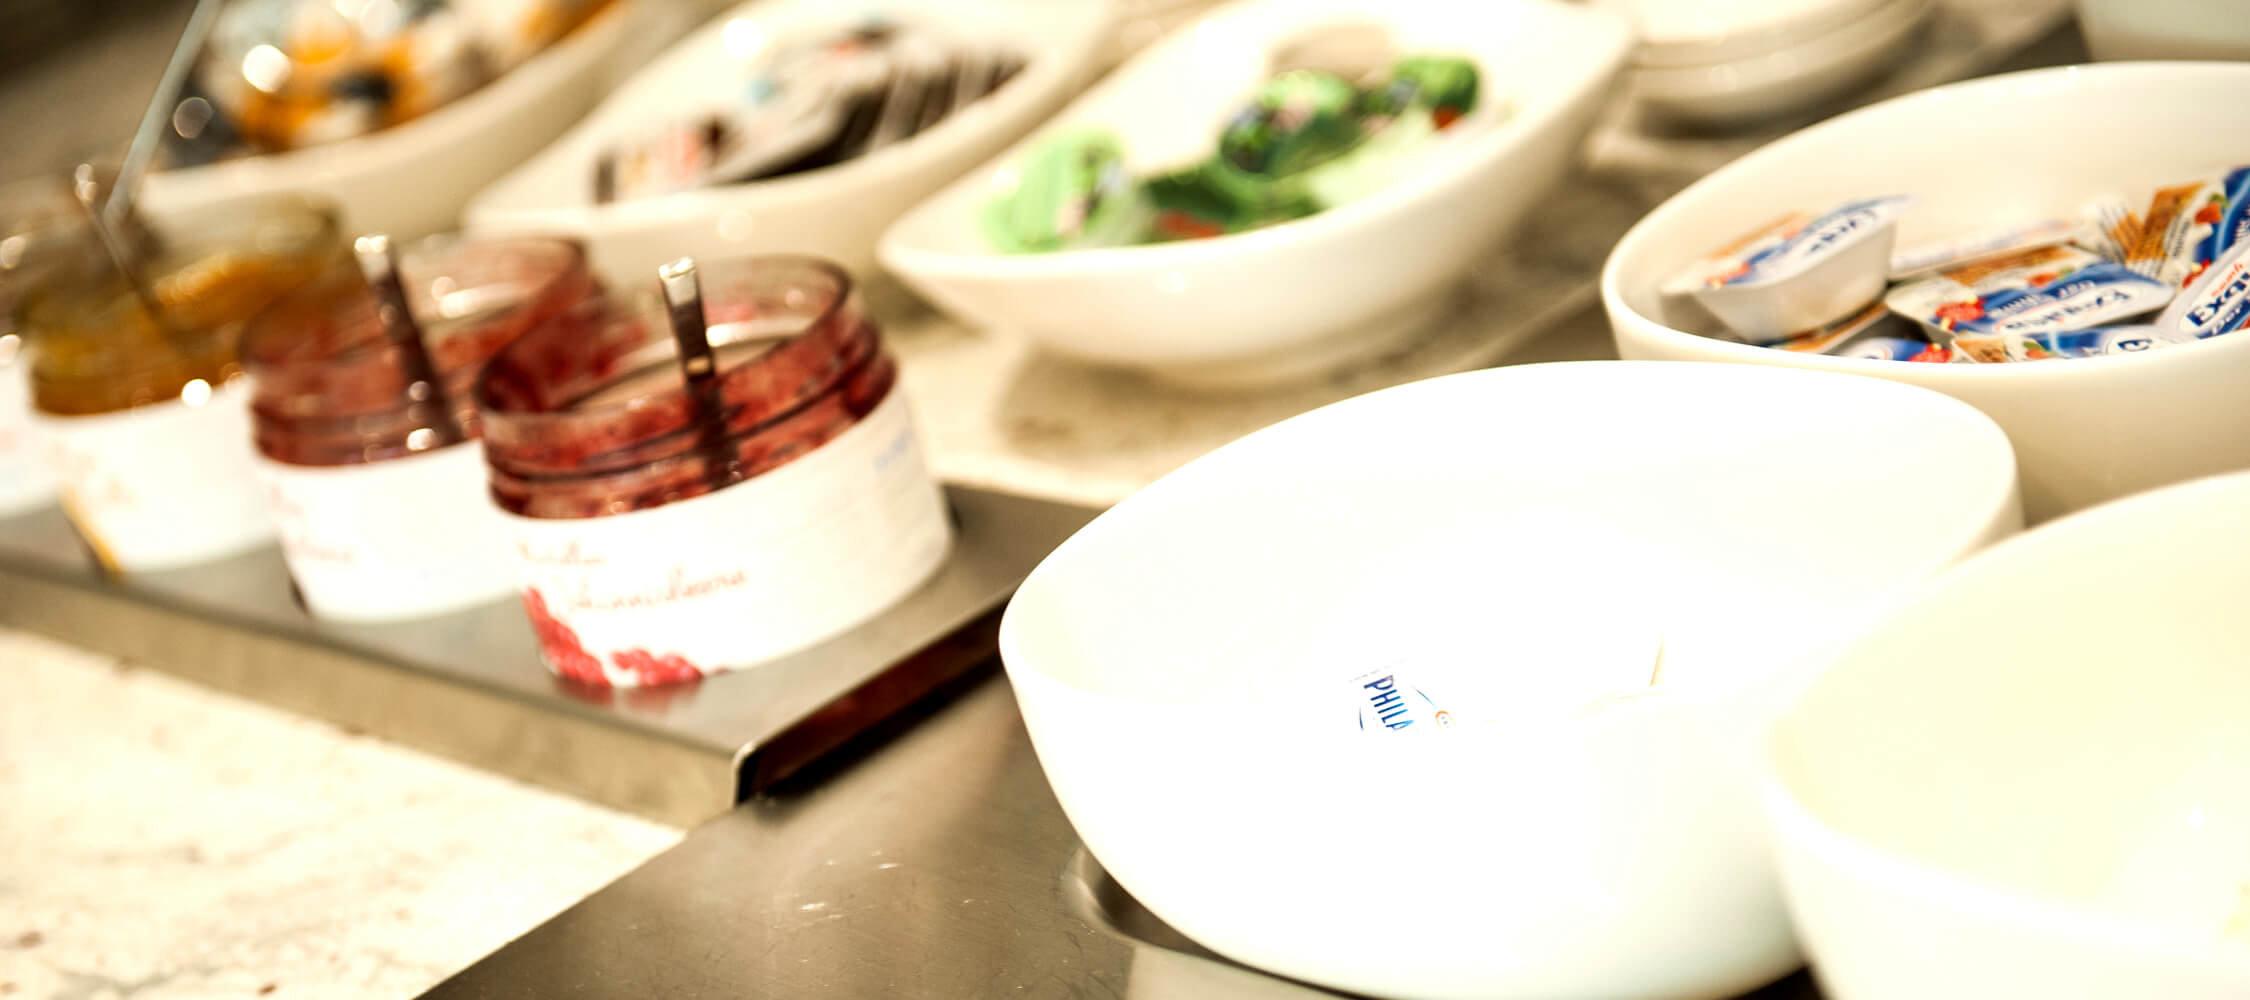 City_Hotel_Merano_Restaurant_Breakfast_Buffet_Fruehstueck_Essen_Auswahl_DSC0516_2250x1000